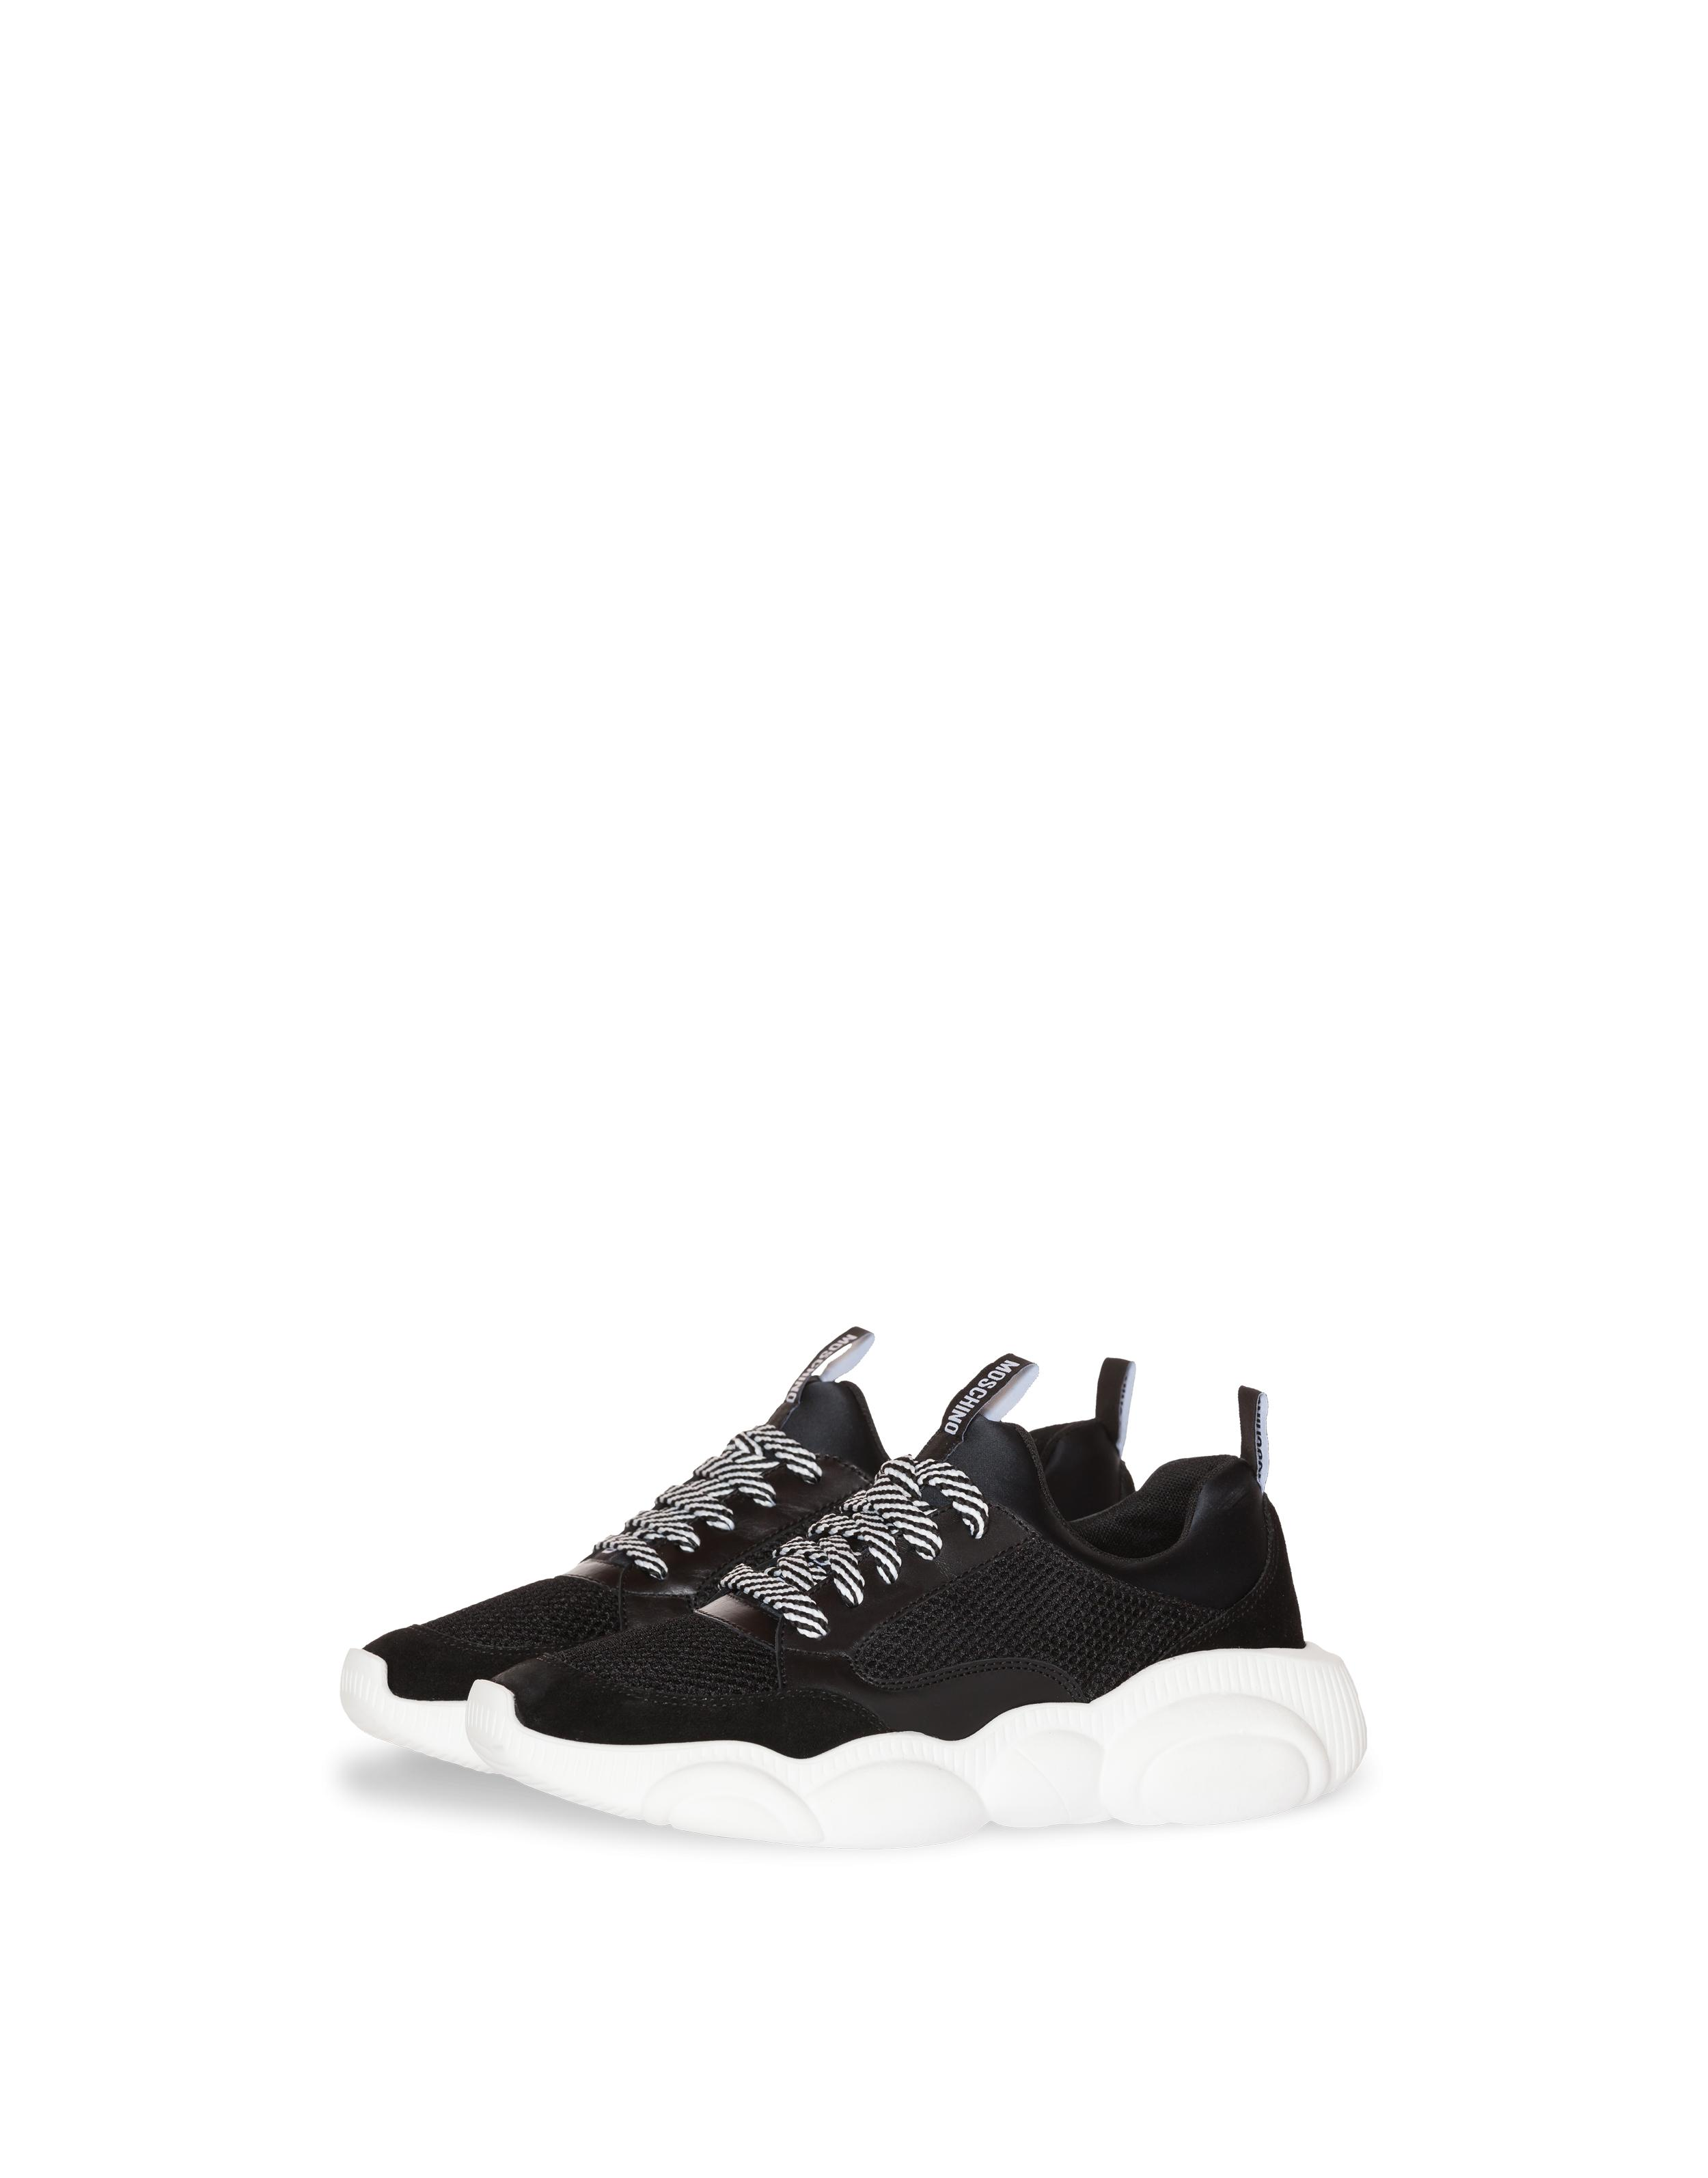 90f699cf40e4e Moschino - Black Teddy Run Sneakers In Mesh, Calfskin And Split Leather -  Lyst. View fullscreen